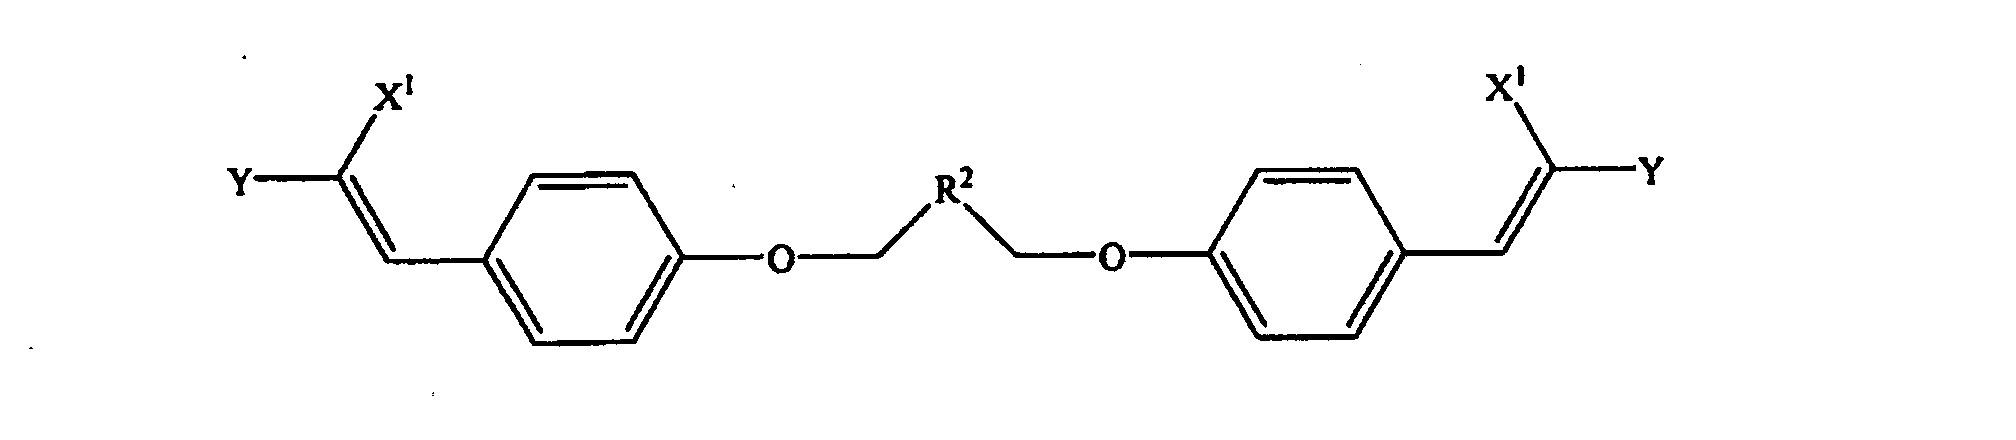 Figure 712011001004300-pct00056